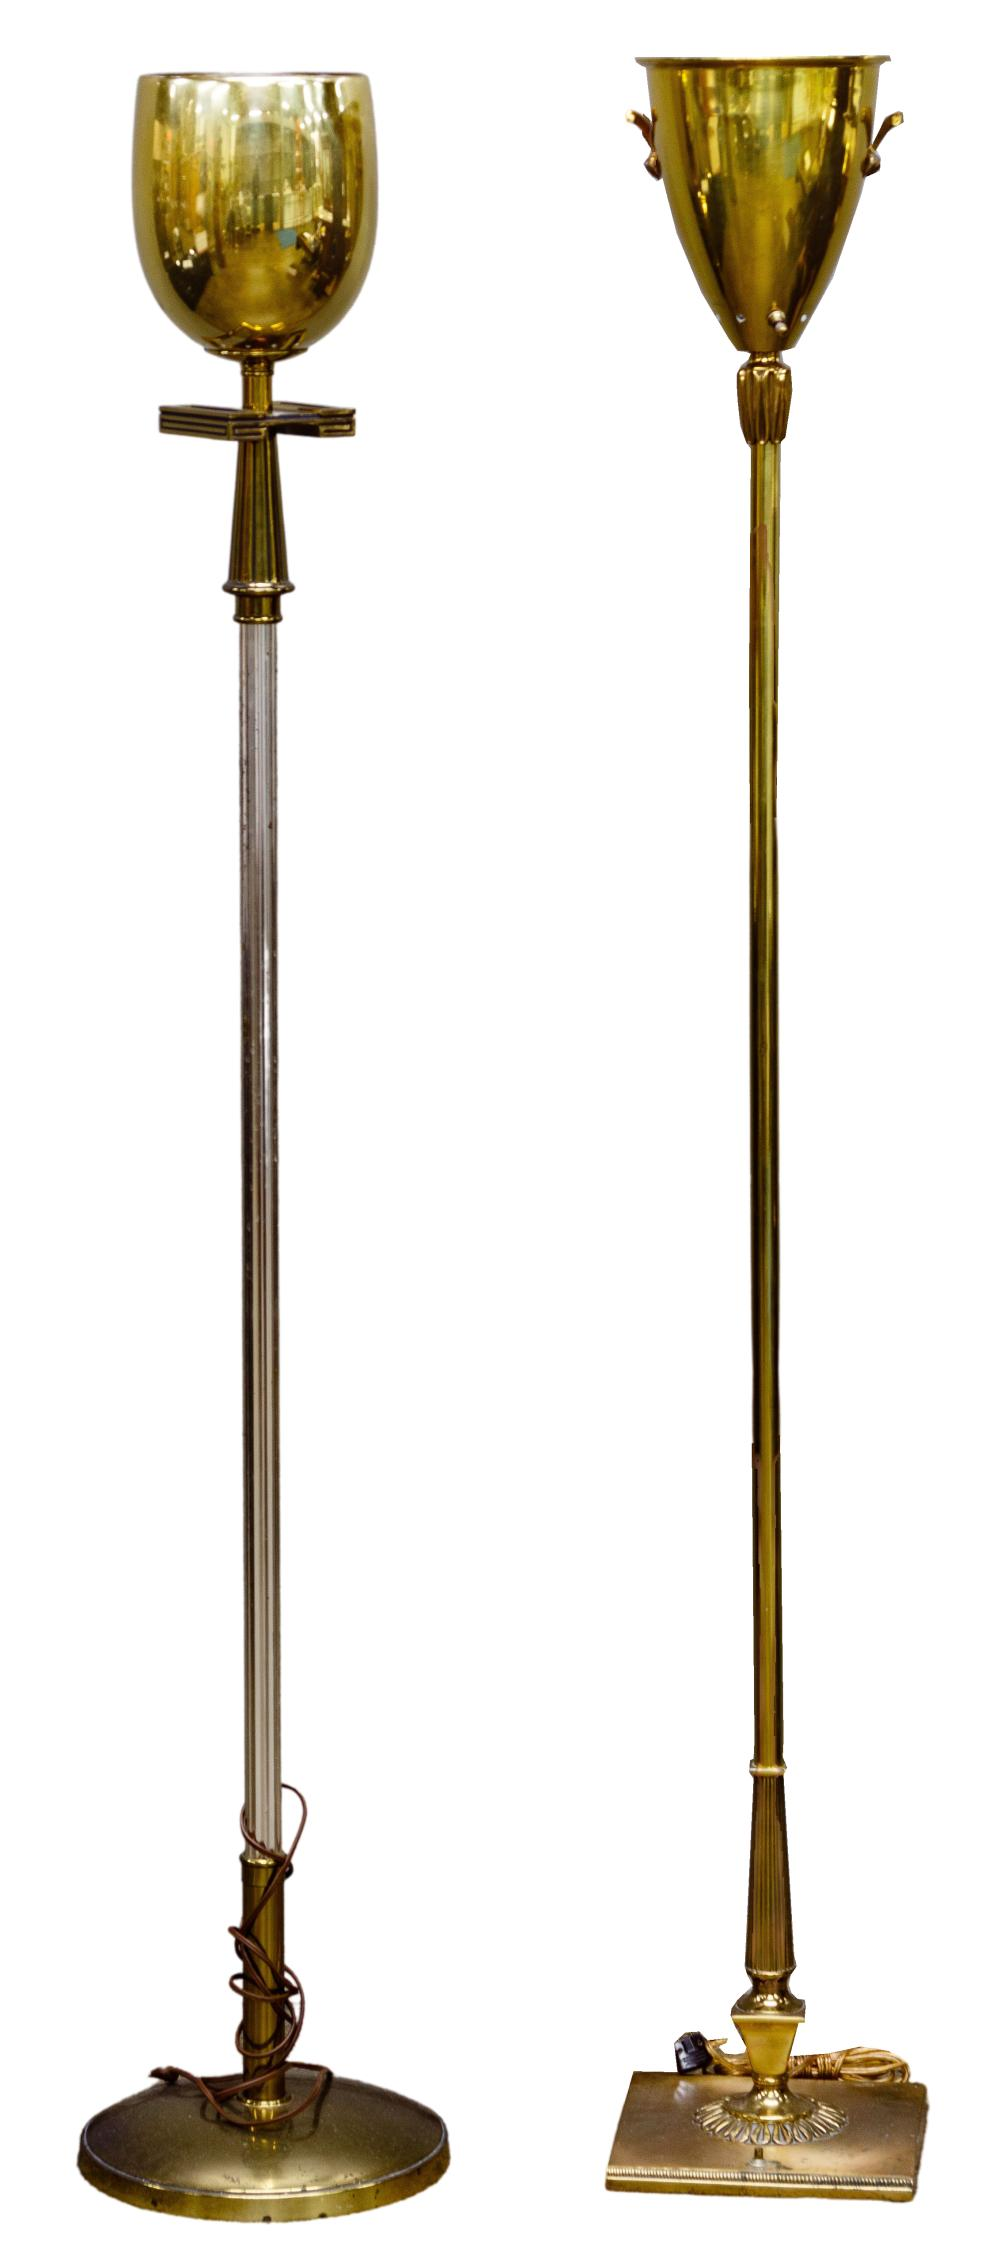 Tommi Parzinger Style Torchiere Floor Lamps